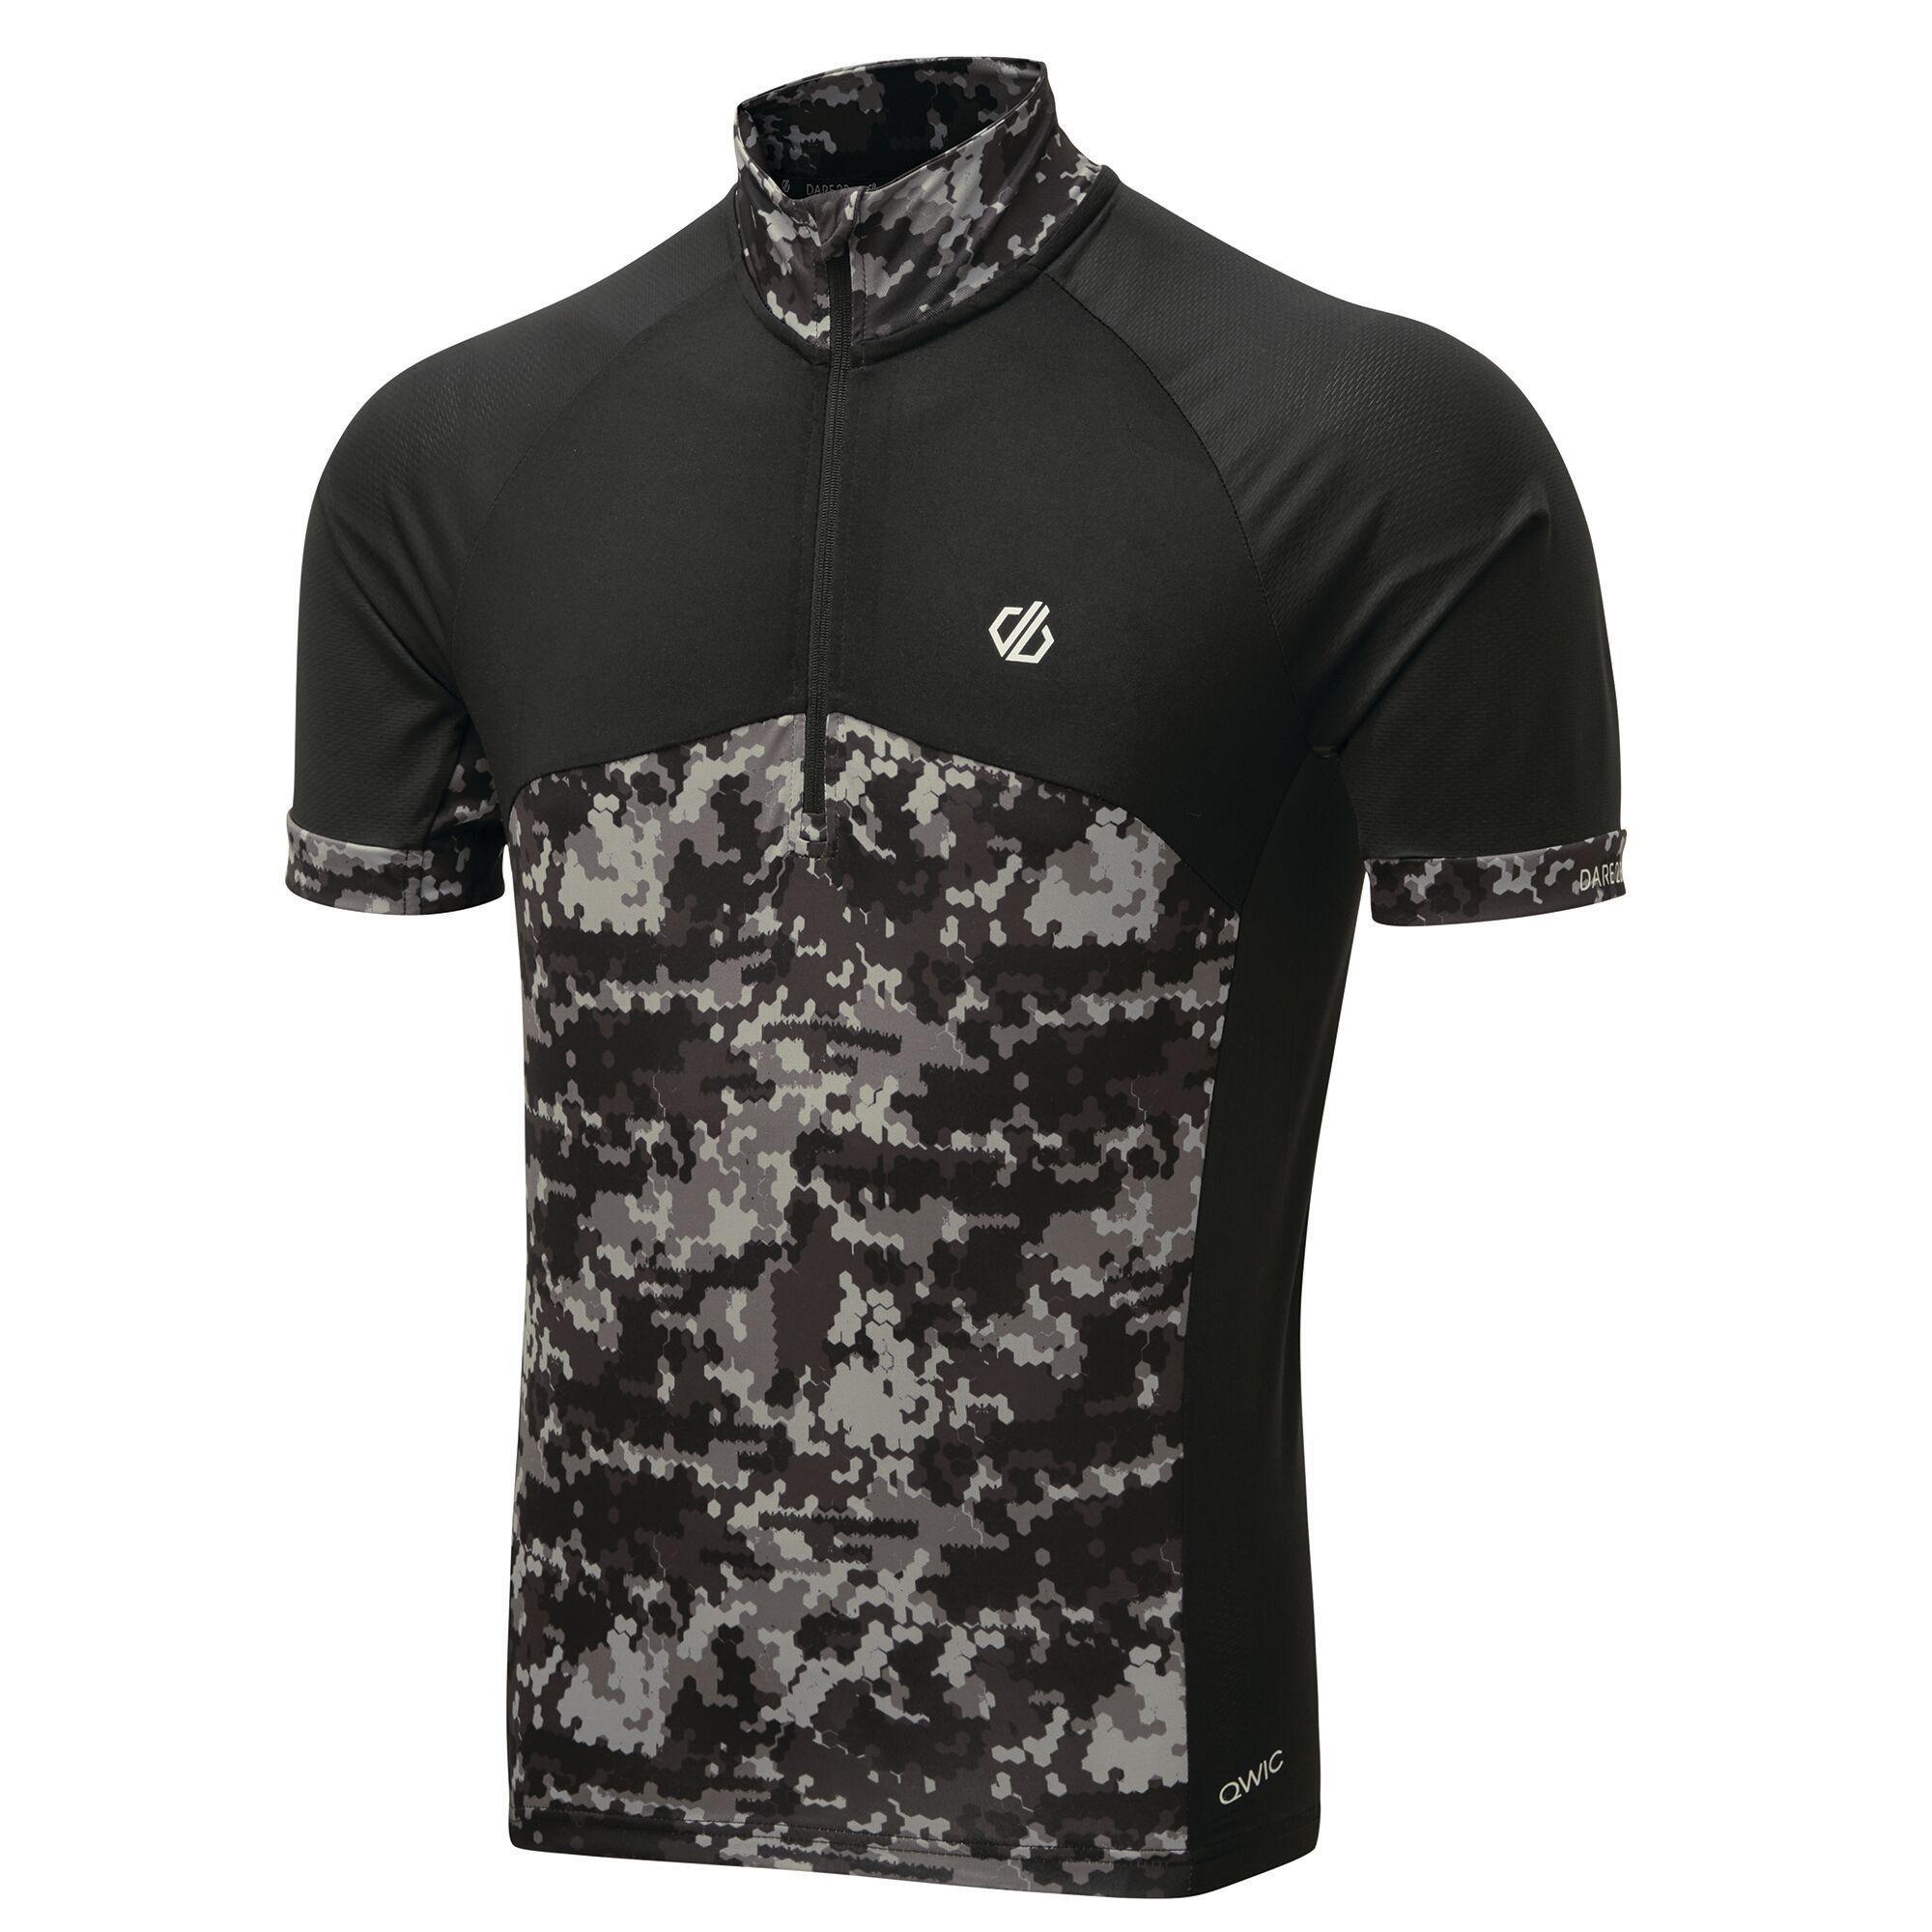 Reflective cycling tops